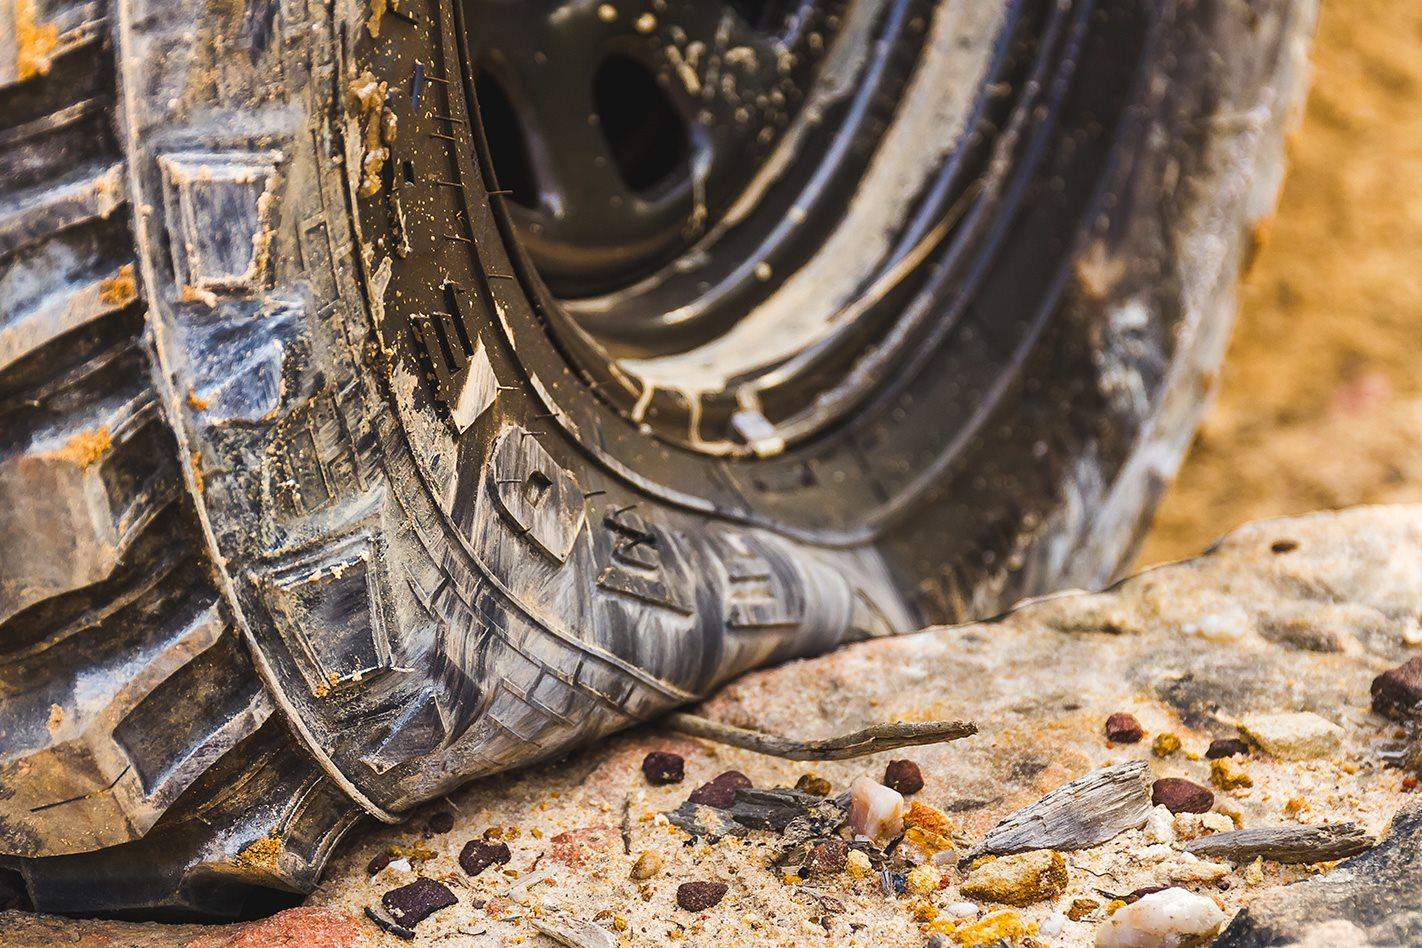 H3 Hummer tyres